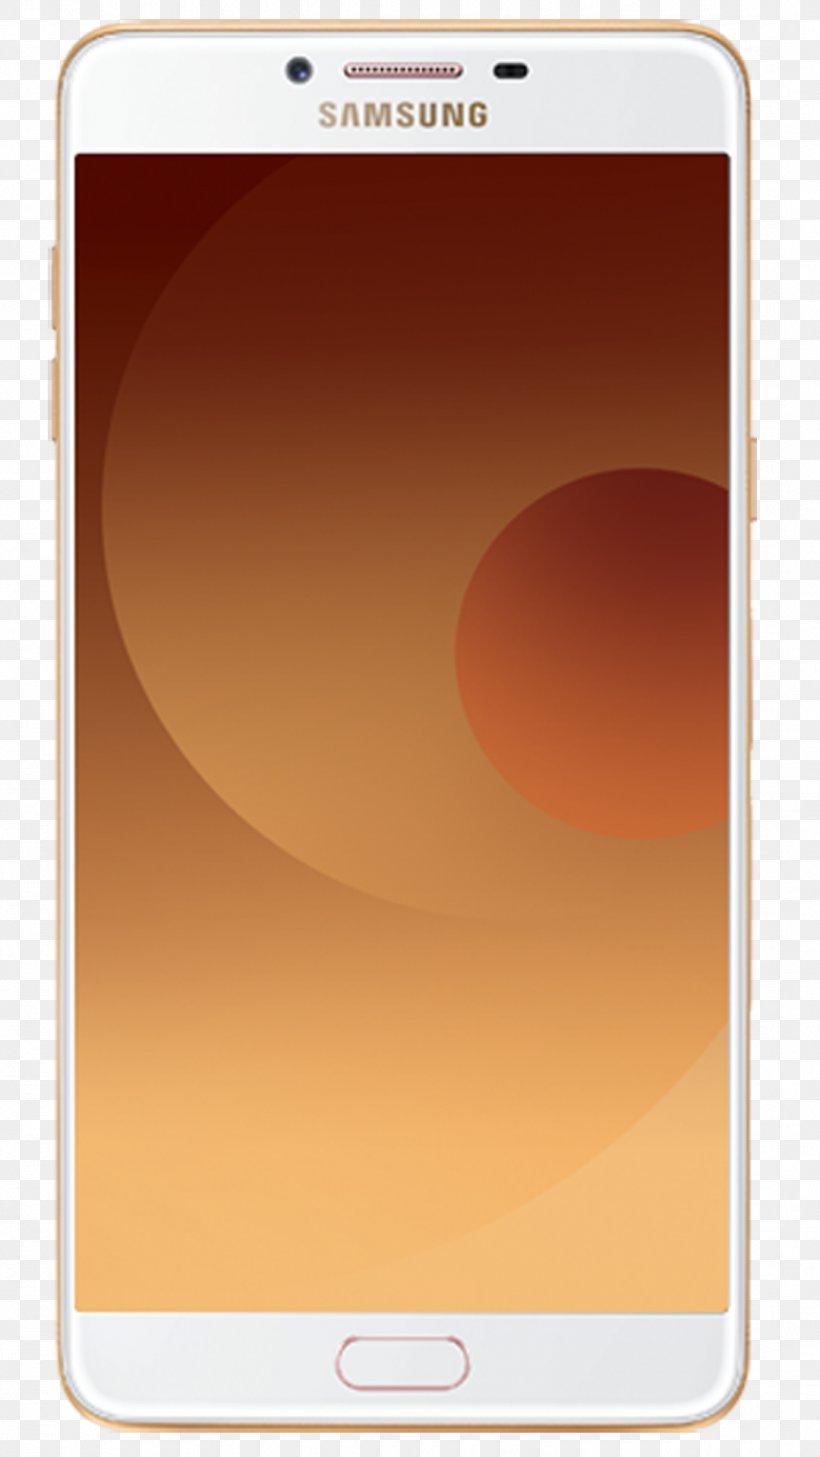 Samsung Galaxy C9 Samsung Galaxy J7 Pro Super Amoled Desktop Wallpaper Png 1080x1920px Samsung Galaxy C9